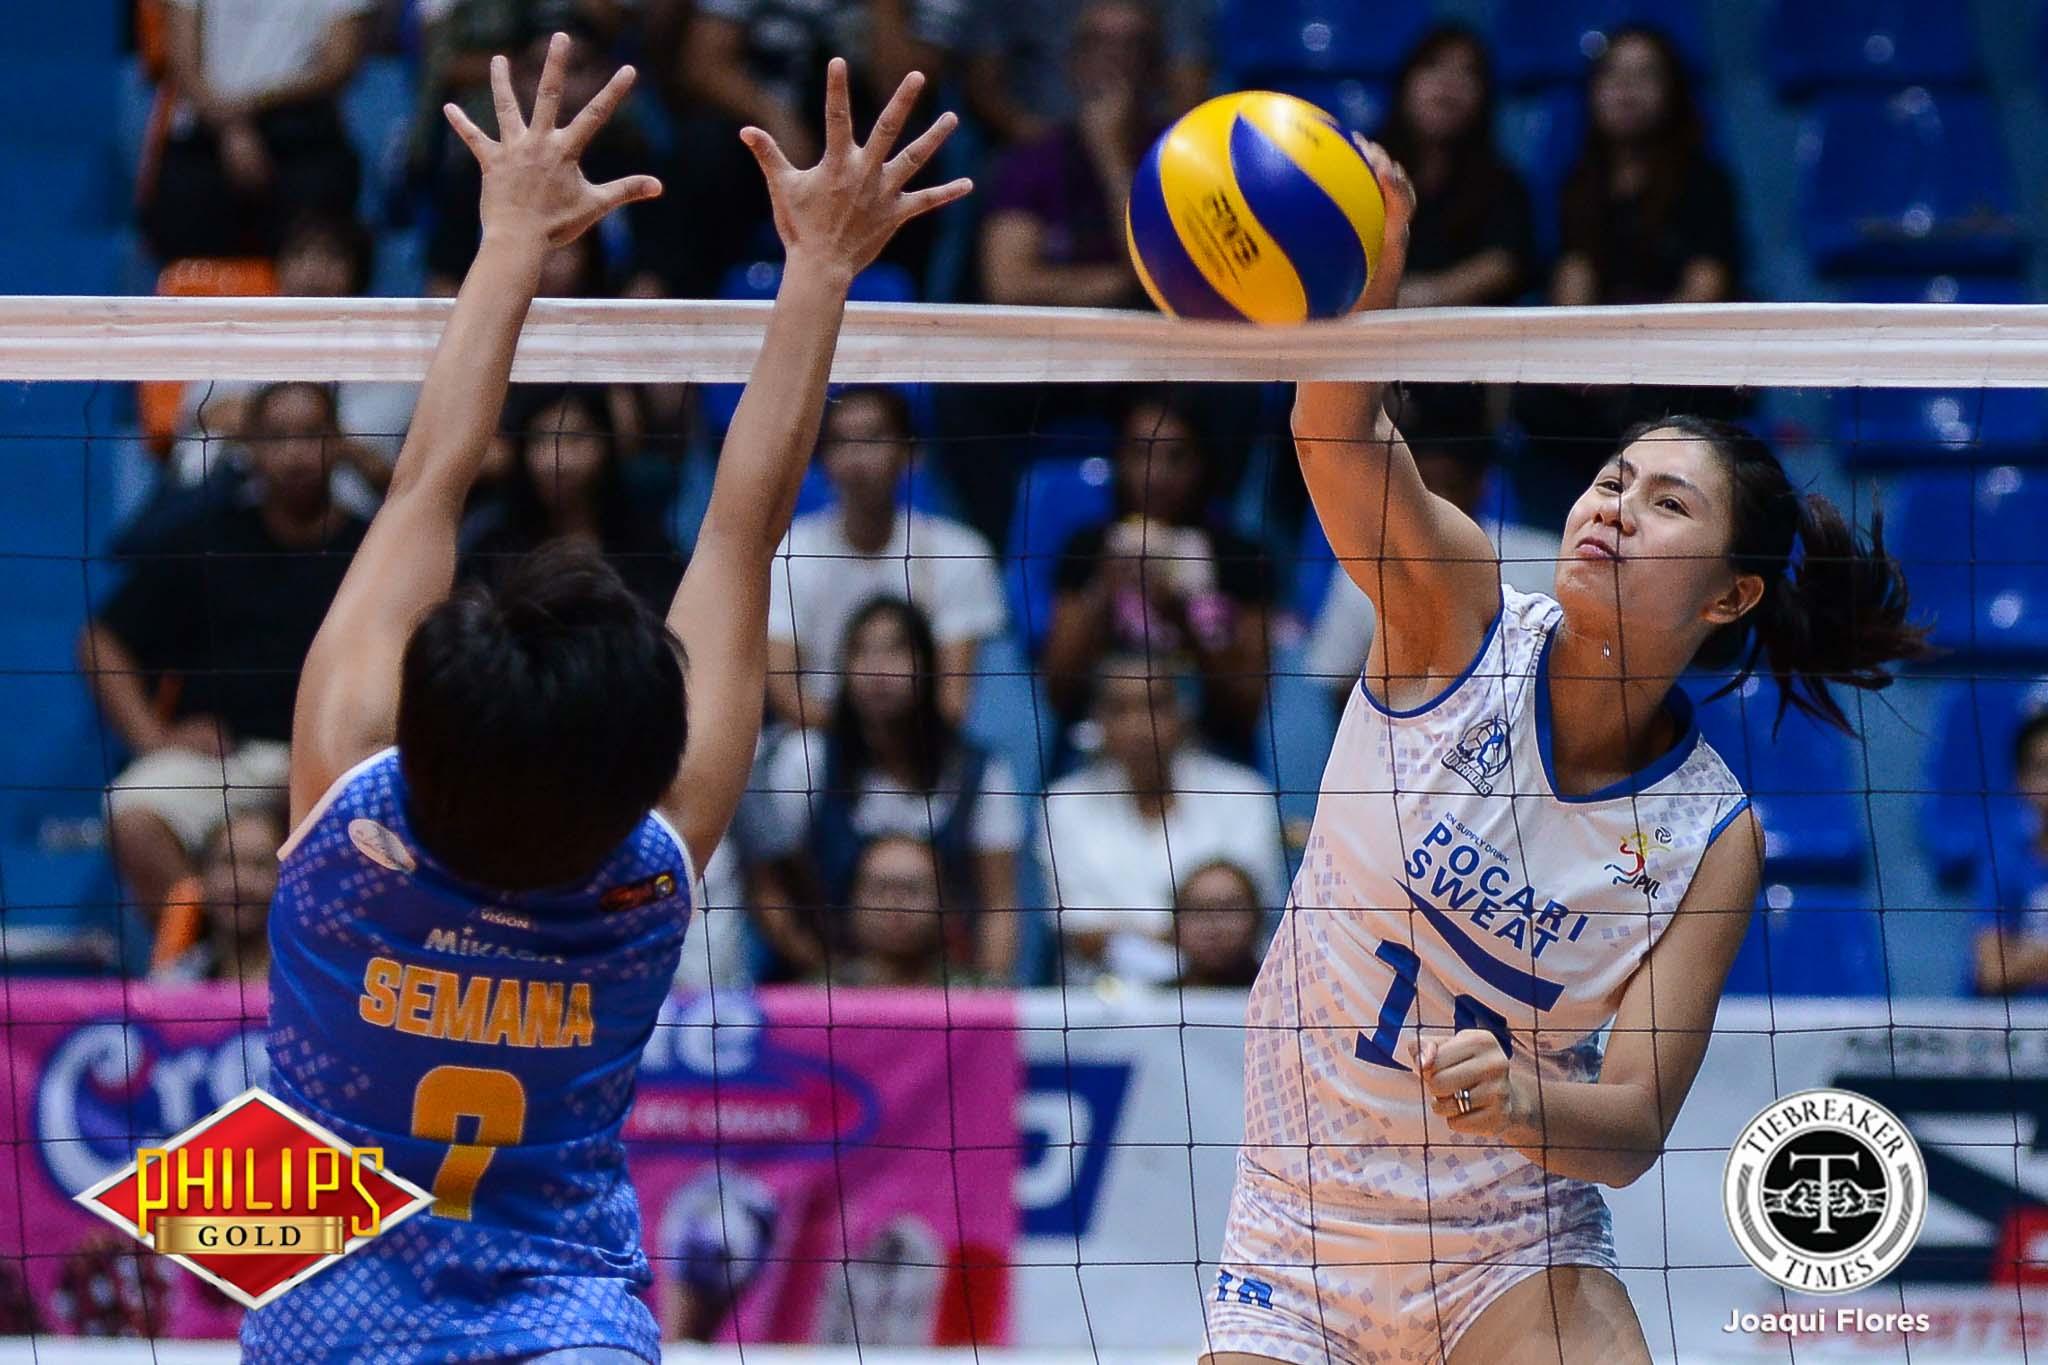 Philippine Sports News - Tiebreaker Times Pocari Sweat's battlecry: 'Ngayon pa ba tayo susuko?' News PVL Volleyball  Pocari Sweat Lady Warriors Myla Pablo 2017 PVL Women's Open Conference 2017 PVL Season